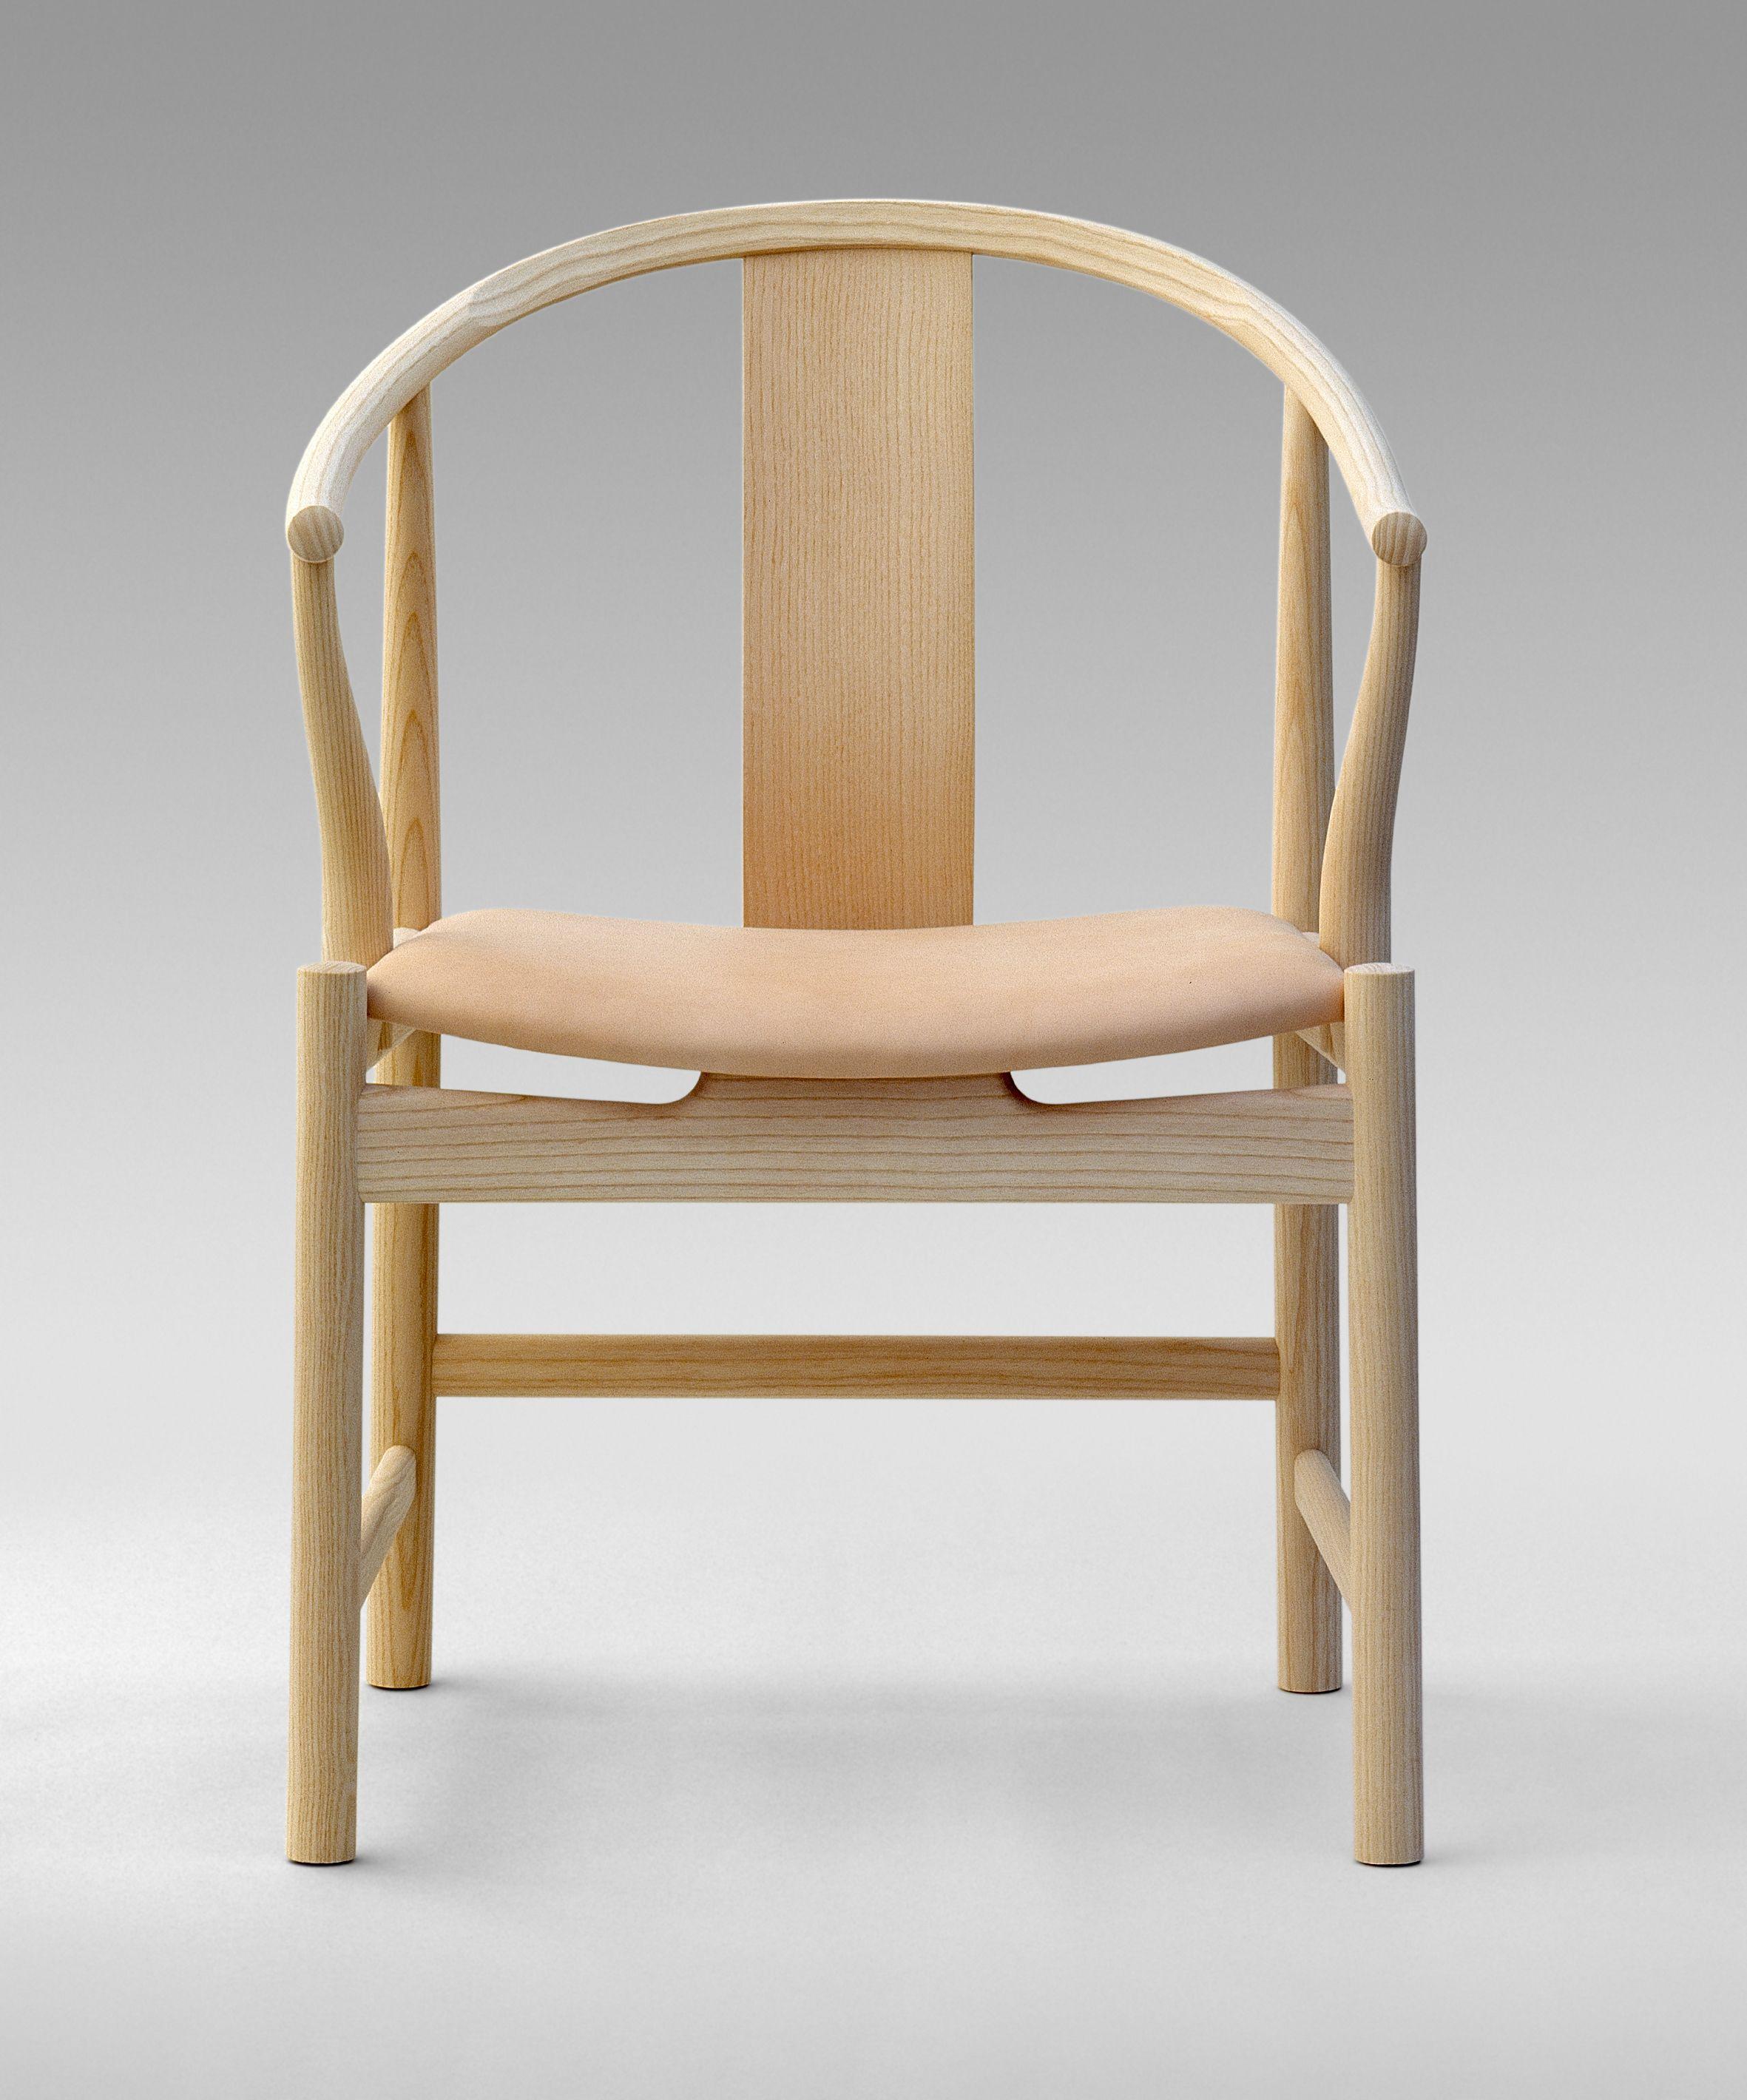 Gentil The Chinese Chair Pp56/pp66 By Hans Wegner Möbel Furniture, Esszimmer,  Hartholzmöbel,